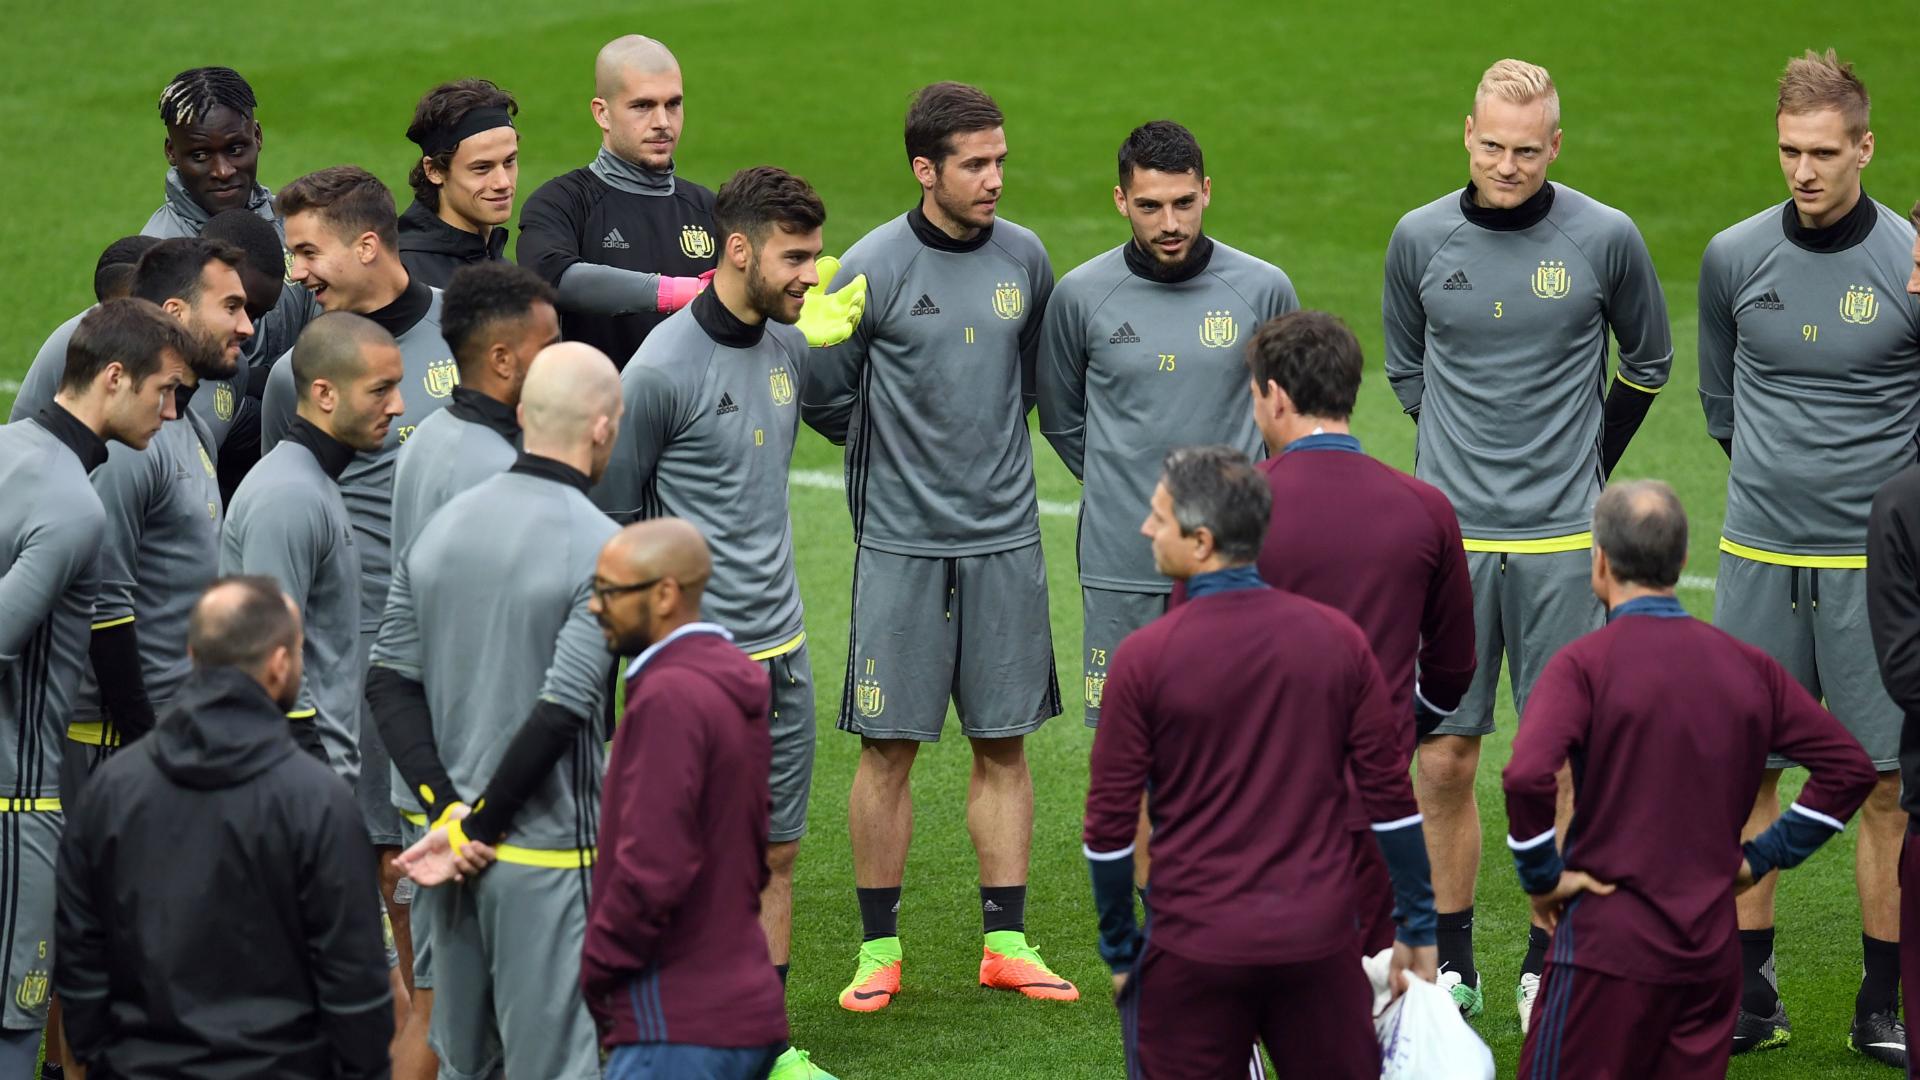 VIDEO- L'Anderlecht si allena in un parco di Manchester